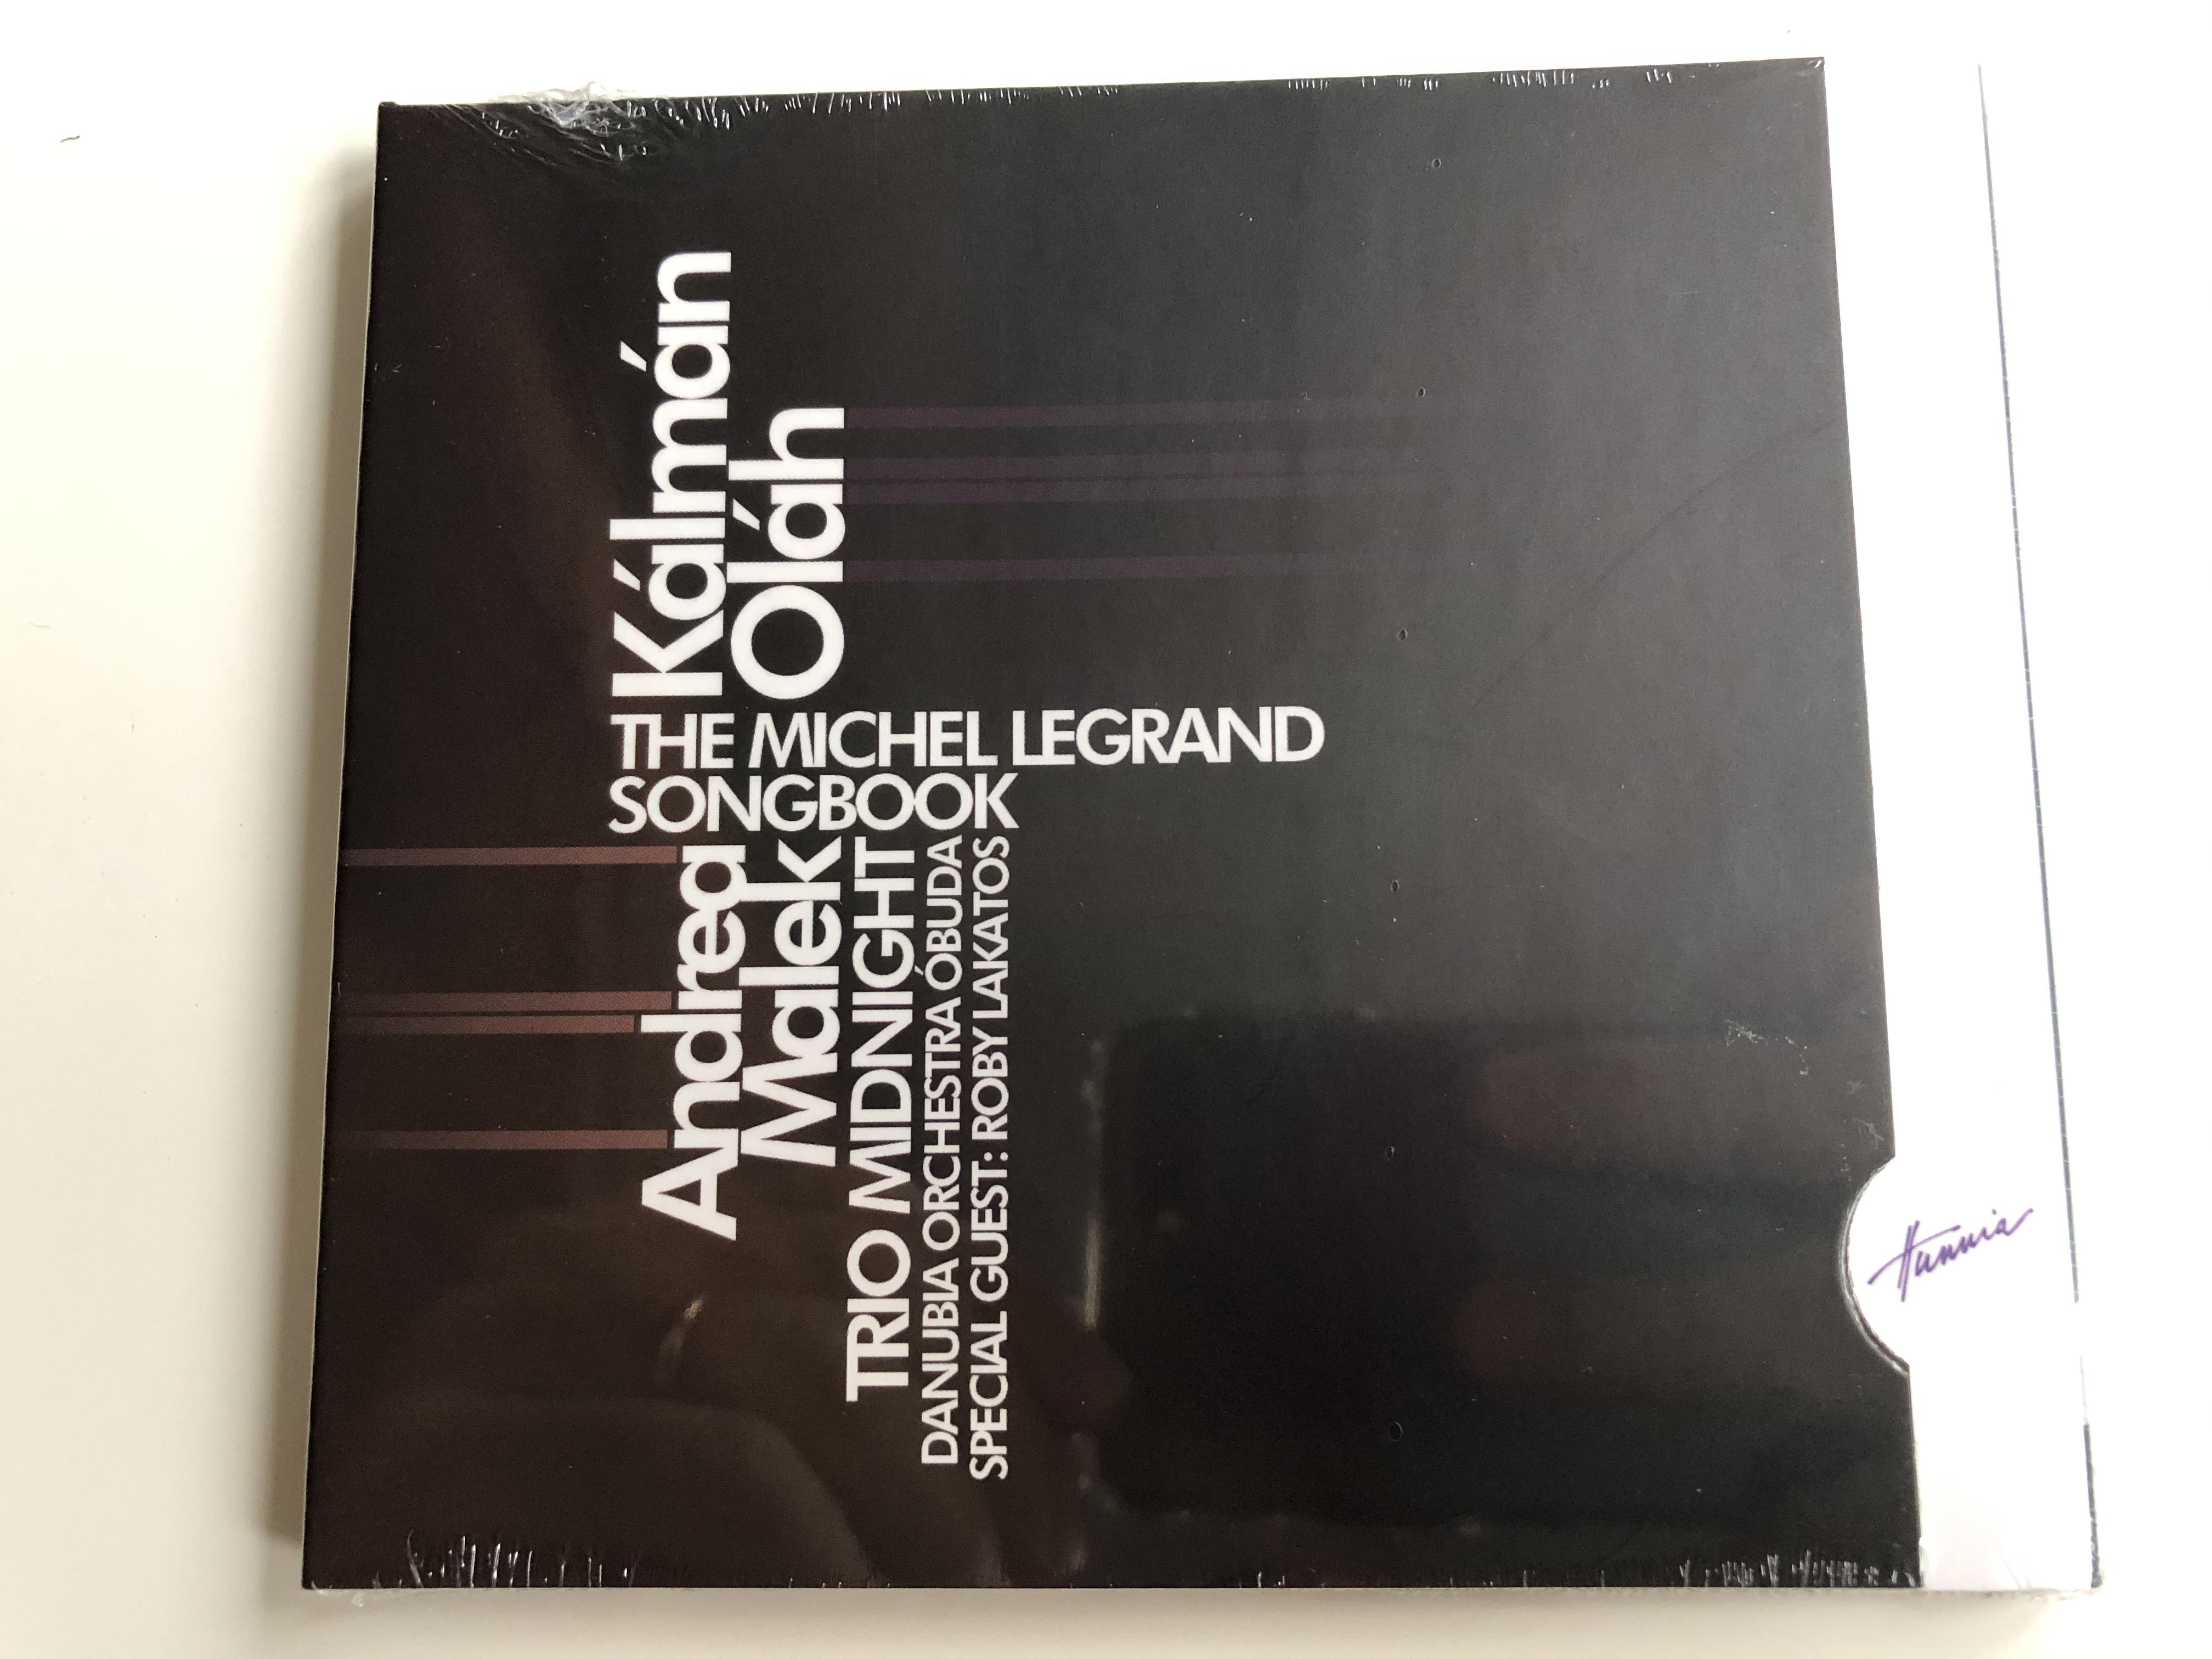 kalman-olah-the-michel-legrand-songbook-andrea-malek-trio-midnight-danubia-orchestra-obuda-special-guest-roby-lakatos-hunnia-records-film-production-audio-cd-2016-hrcd1608-1-.jpg